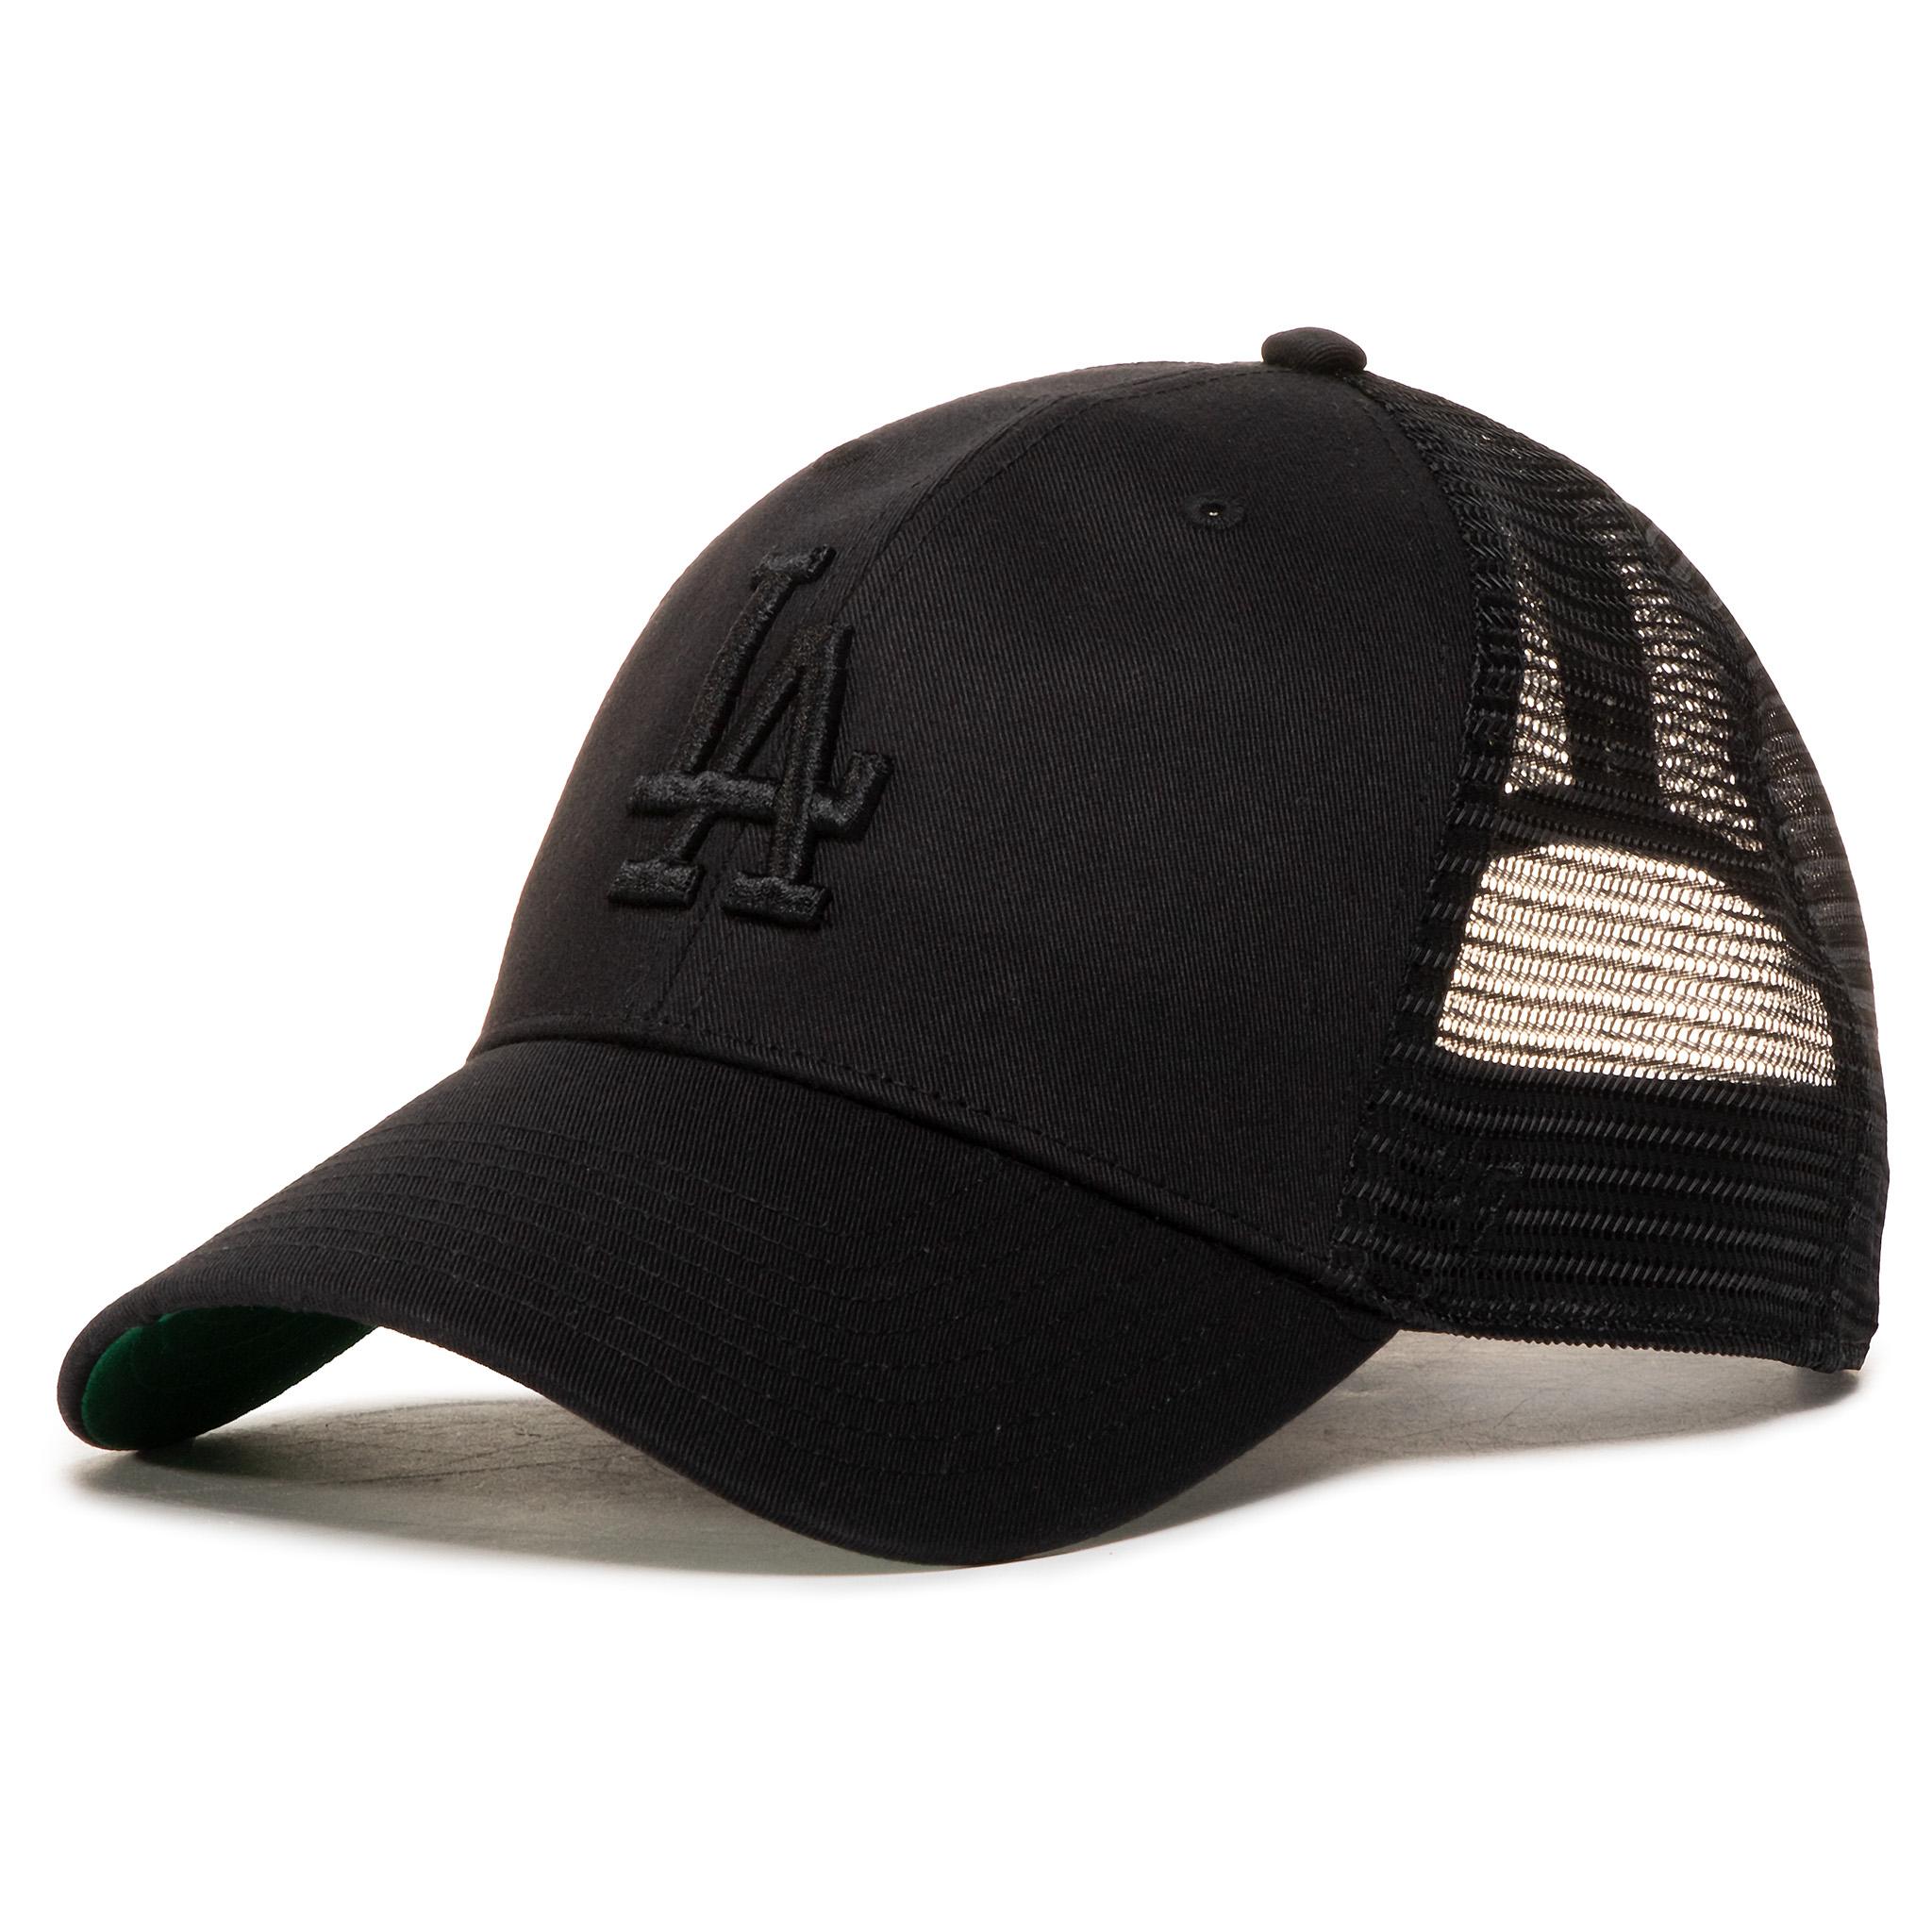 Image of Cap 47 BRAND - Mlb Los Angeles Dodgers Branson B-BRANS12CTP-BKA Black